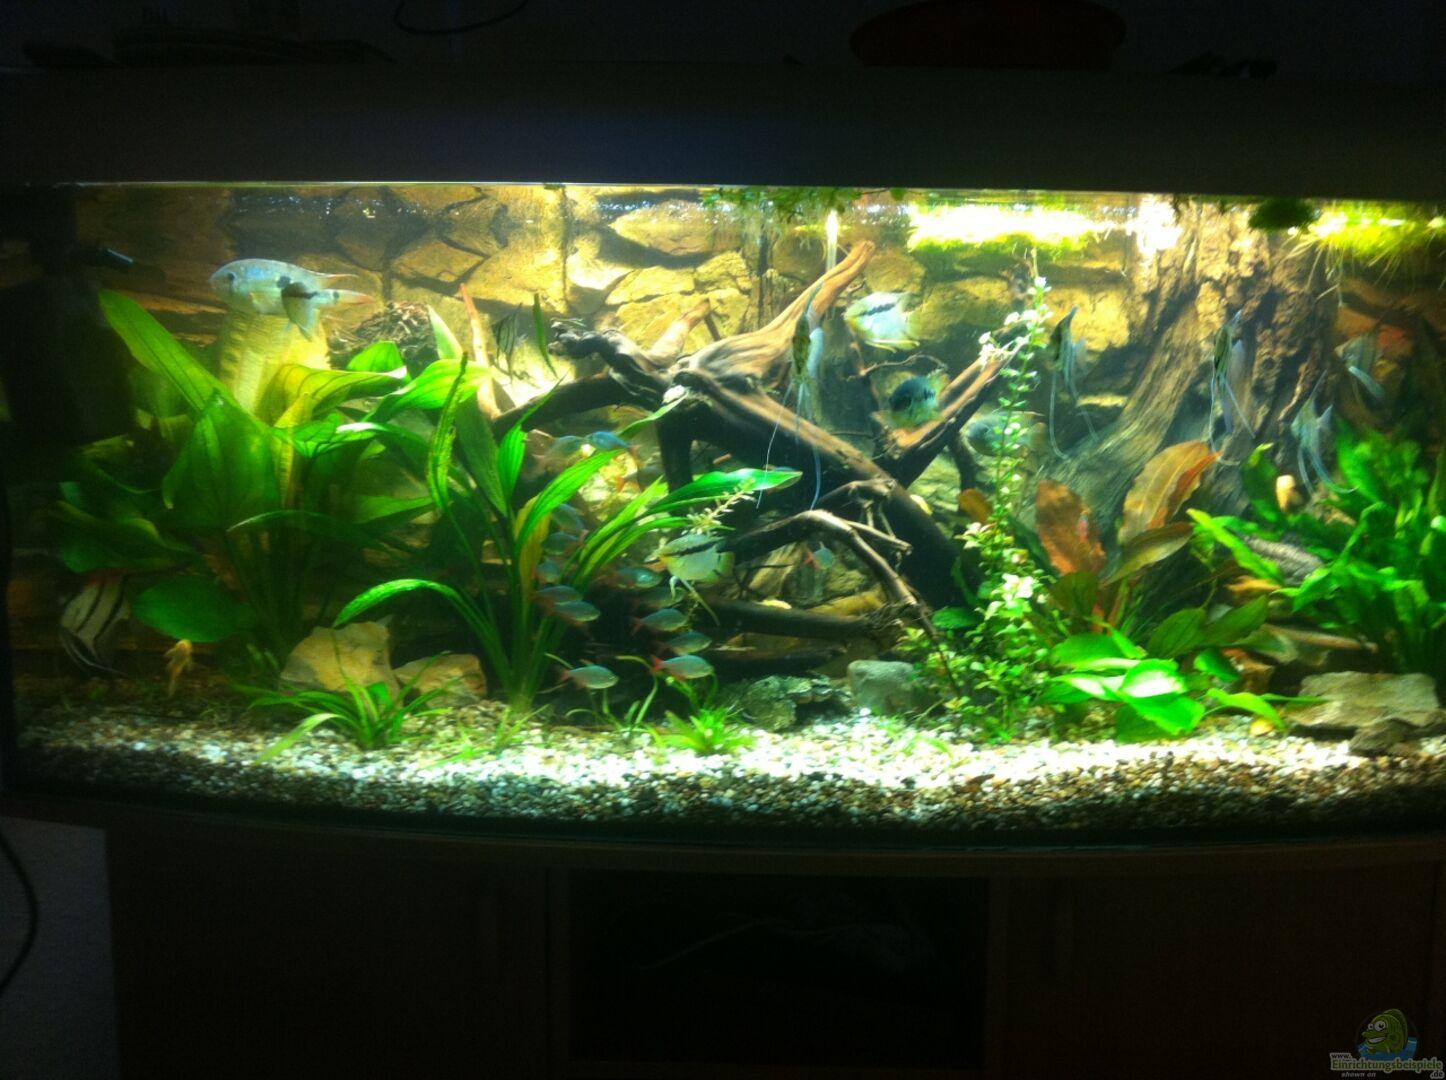 aquarium von red l 23736 mein 450l amazonasbecken. Black Bedroom Furniture Sets. Home Design Ideas